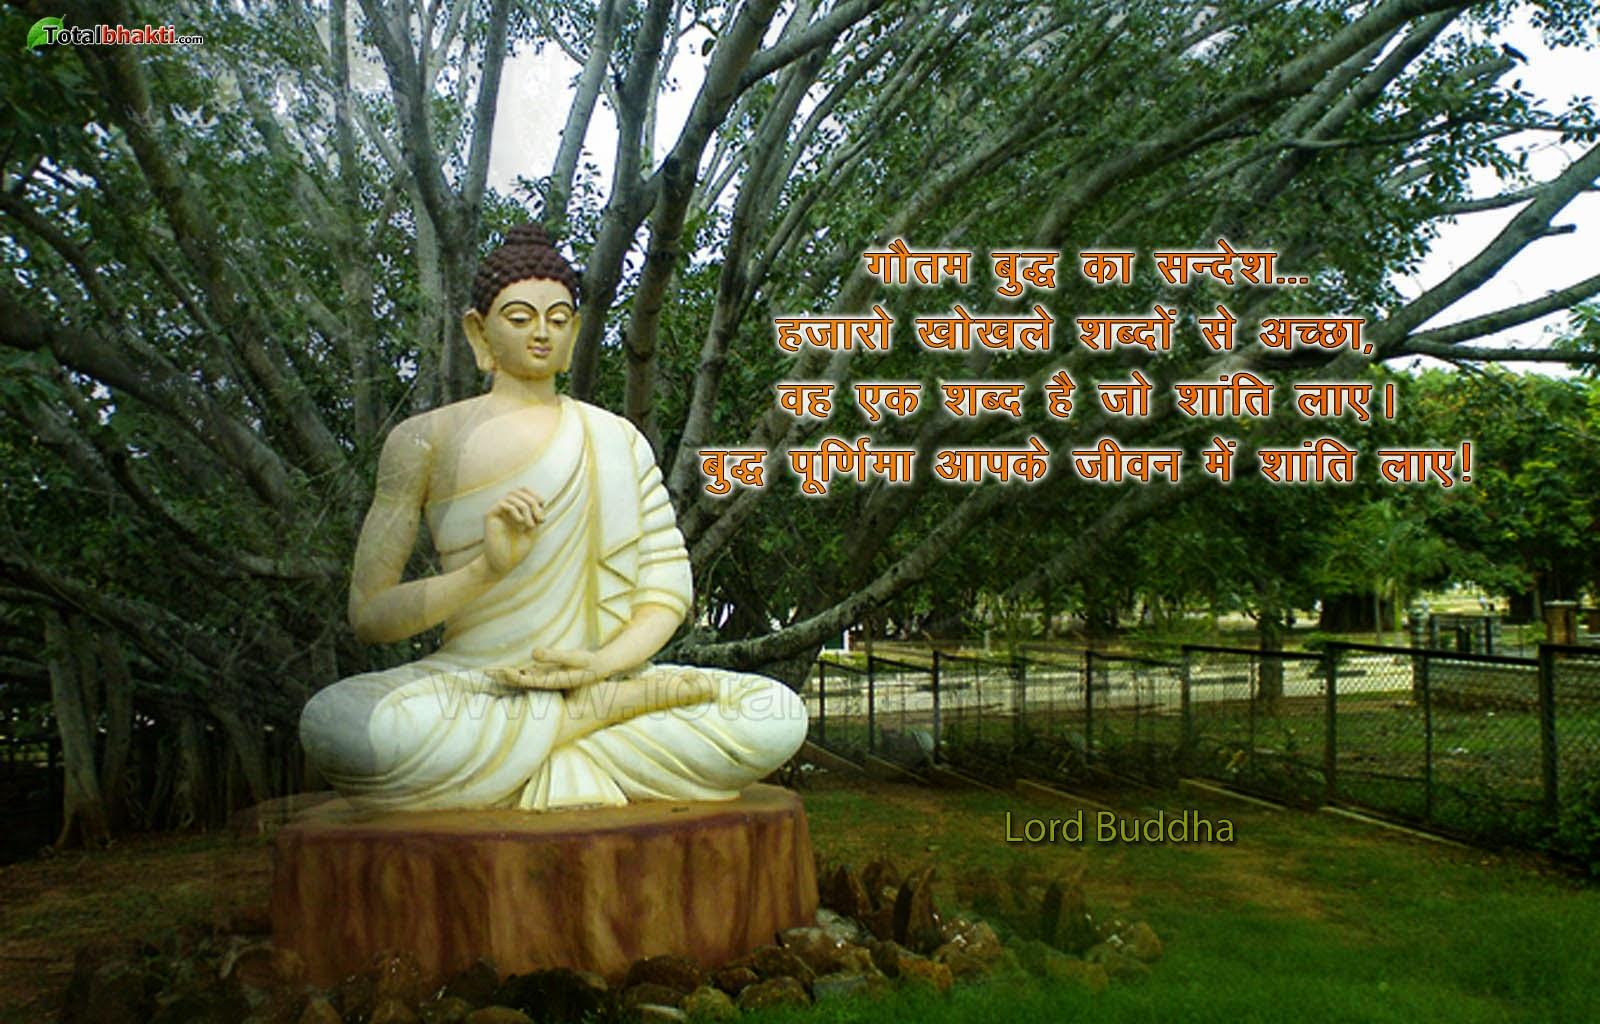 buddha quotes in hindi quotesgram